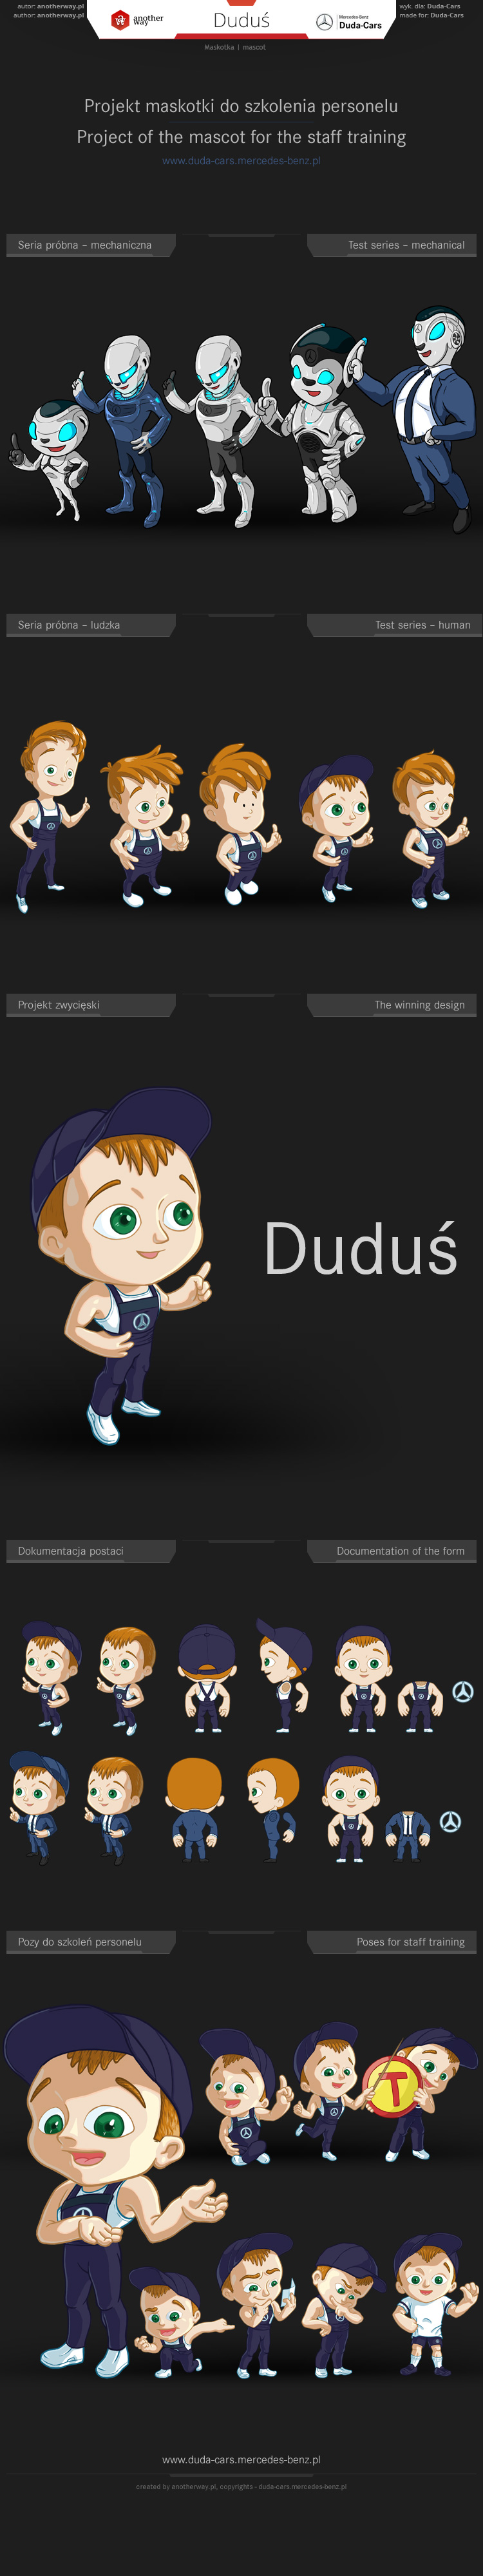 Dudus by KonaRos